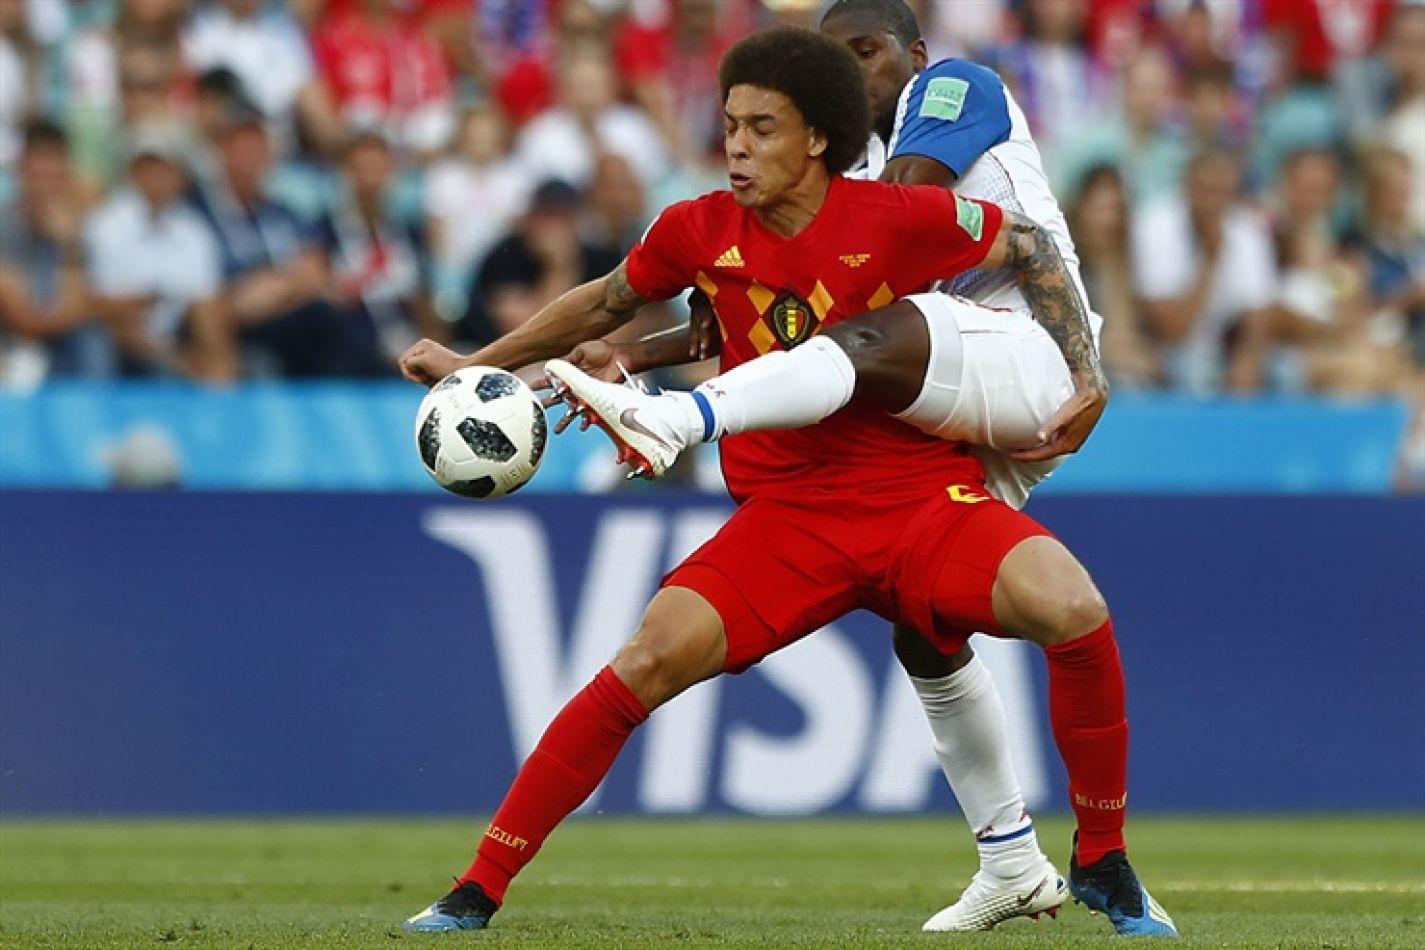 Goleada de Bélgica a Panamá